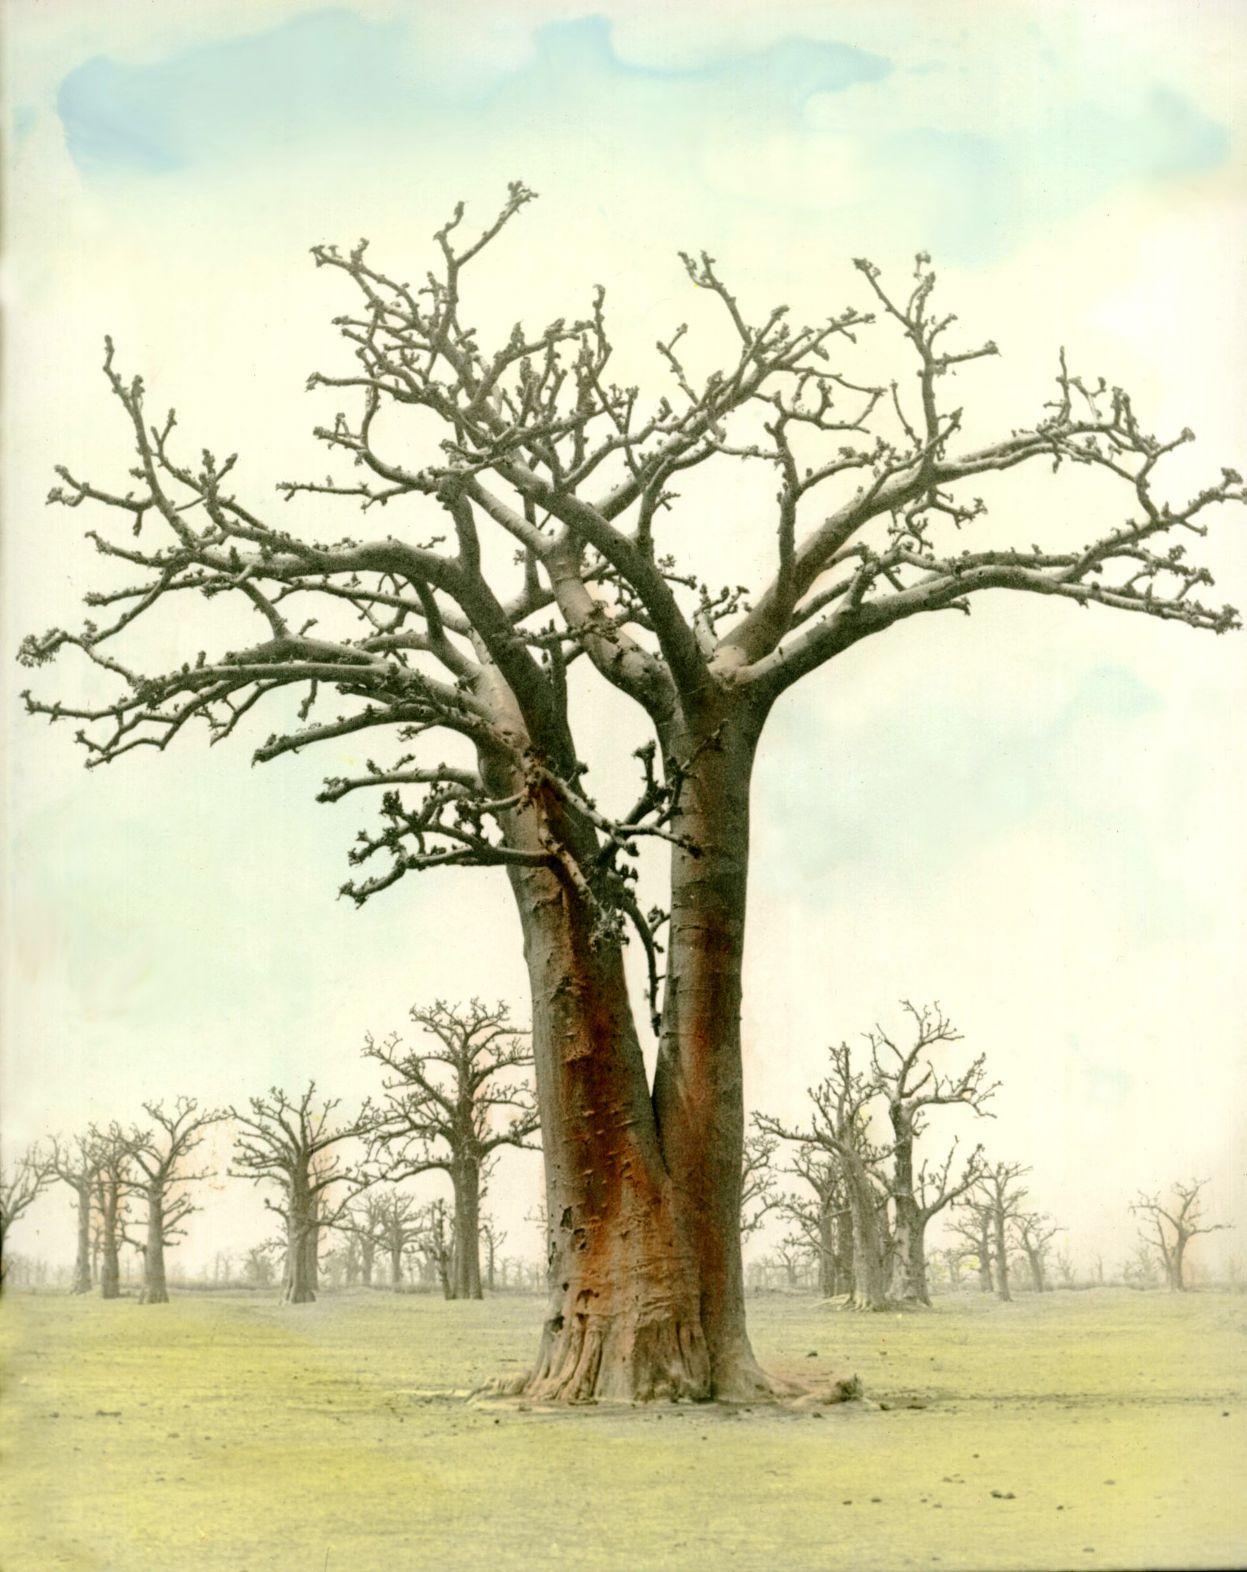 La sombra del Baobab